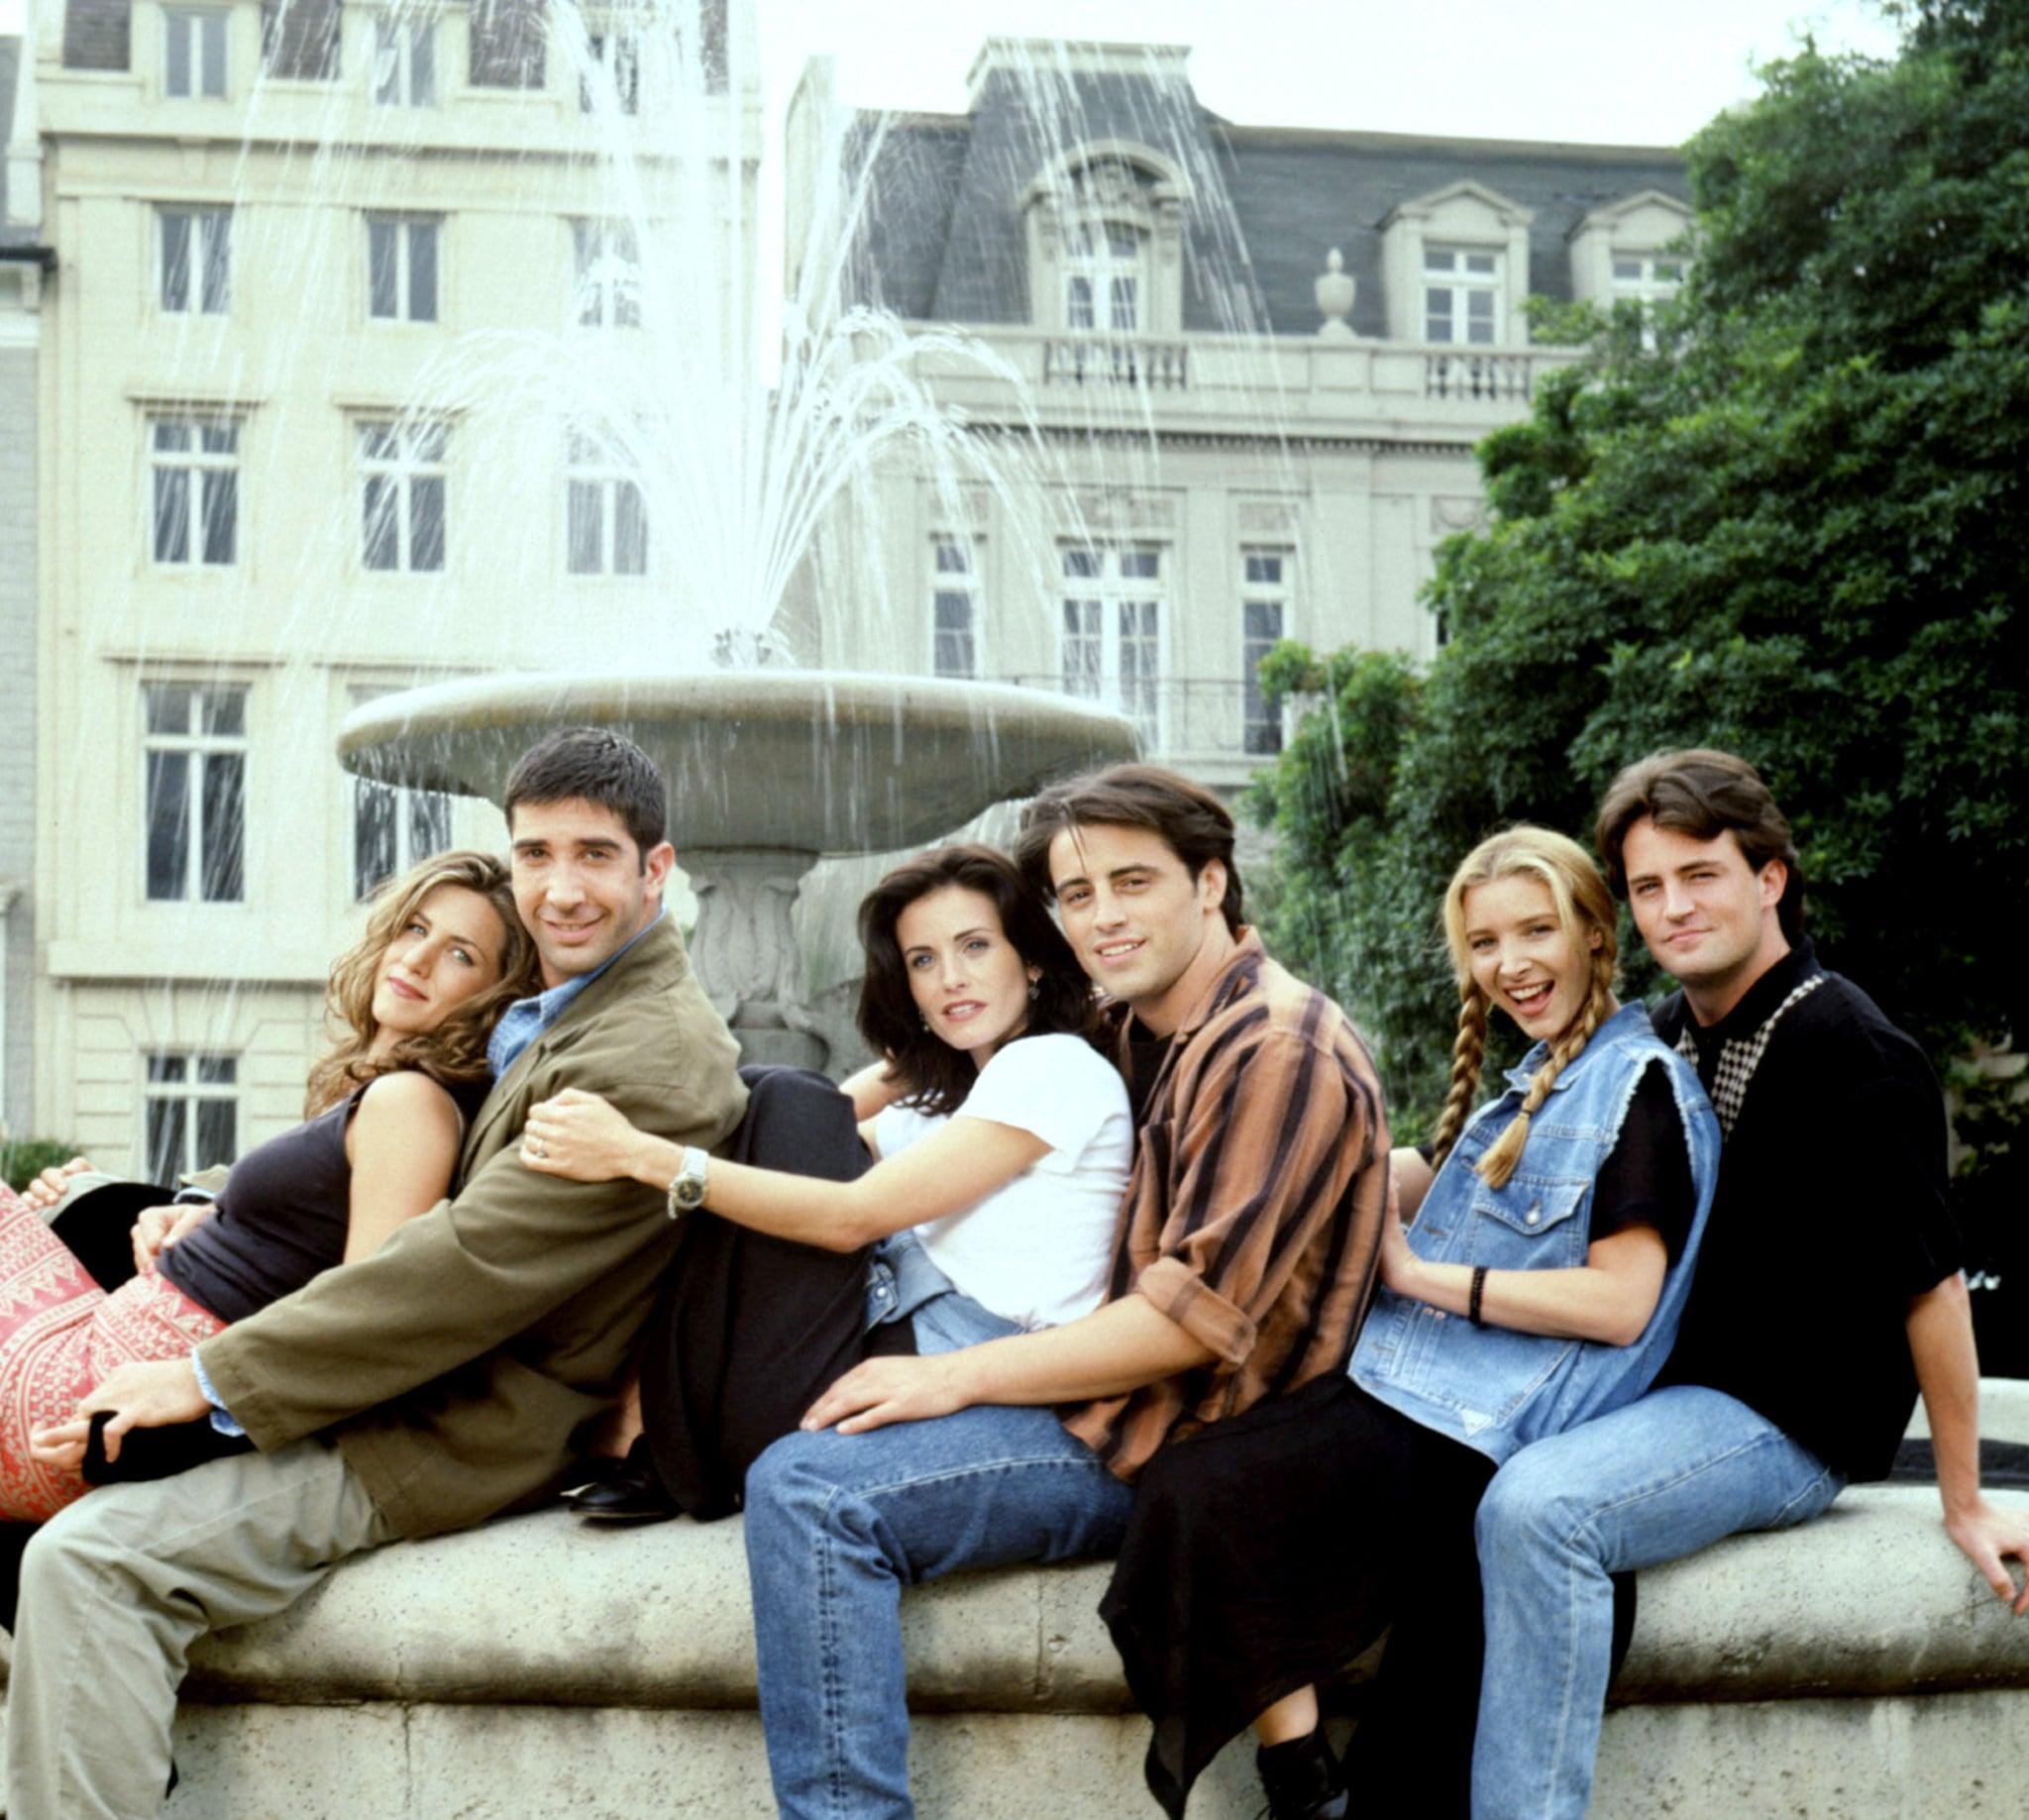 FRIENDS, Jennifer Aniston, David Schwimmer, Courteney Cox Arquette, Matt LeBlanc, Lisa Kudrow, Matthew Perry, (Season 1), 1994-2004,  Warner Bros. / Courtesy: Everett Collection